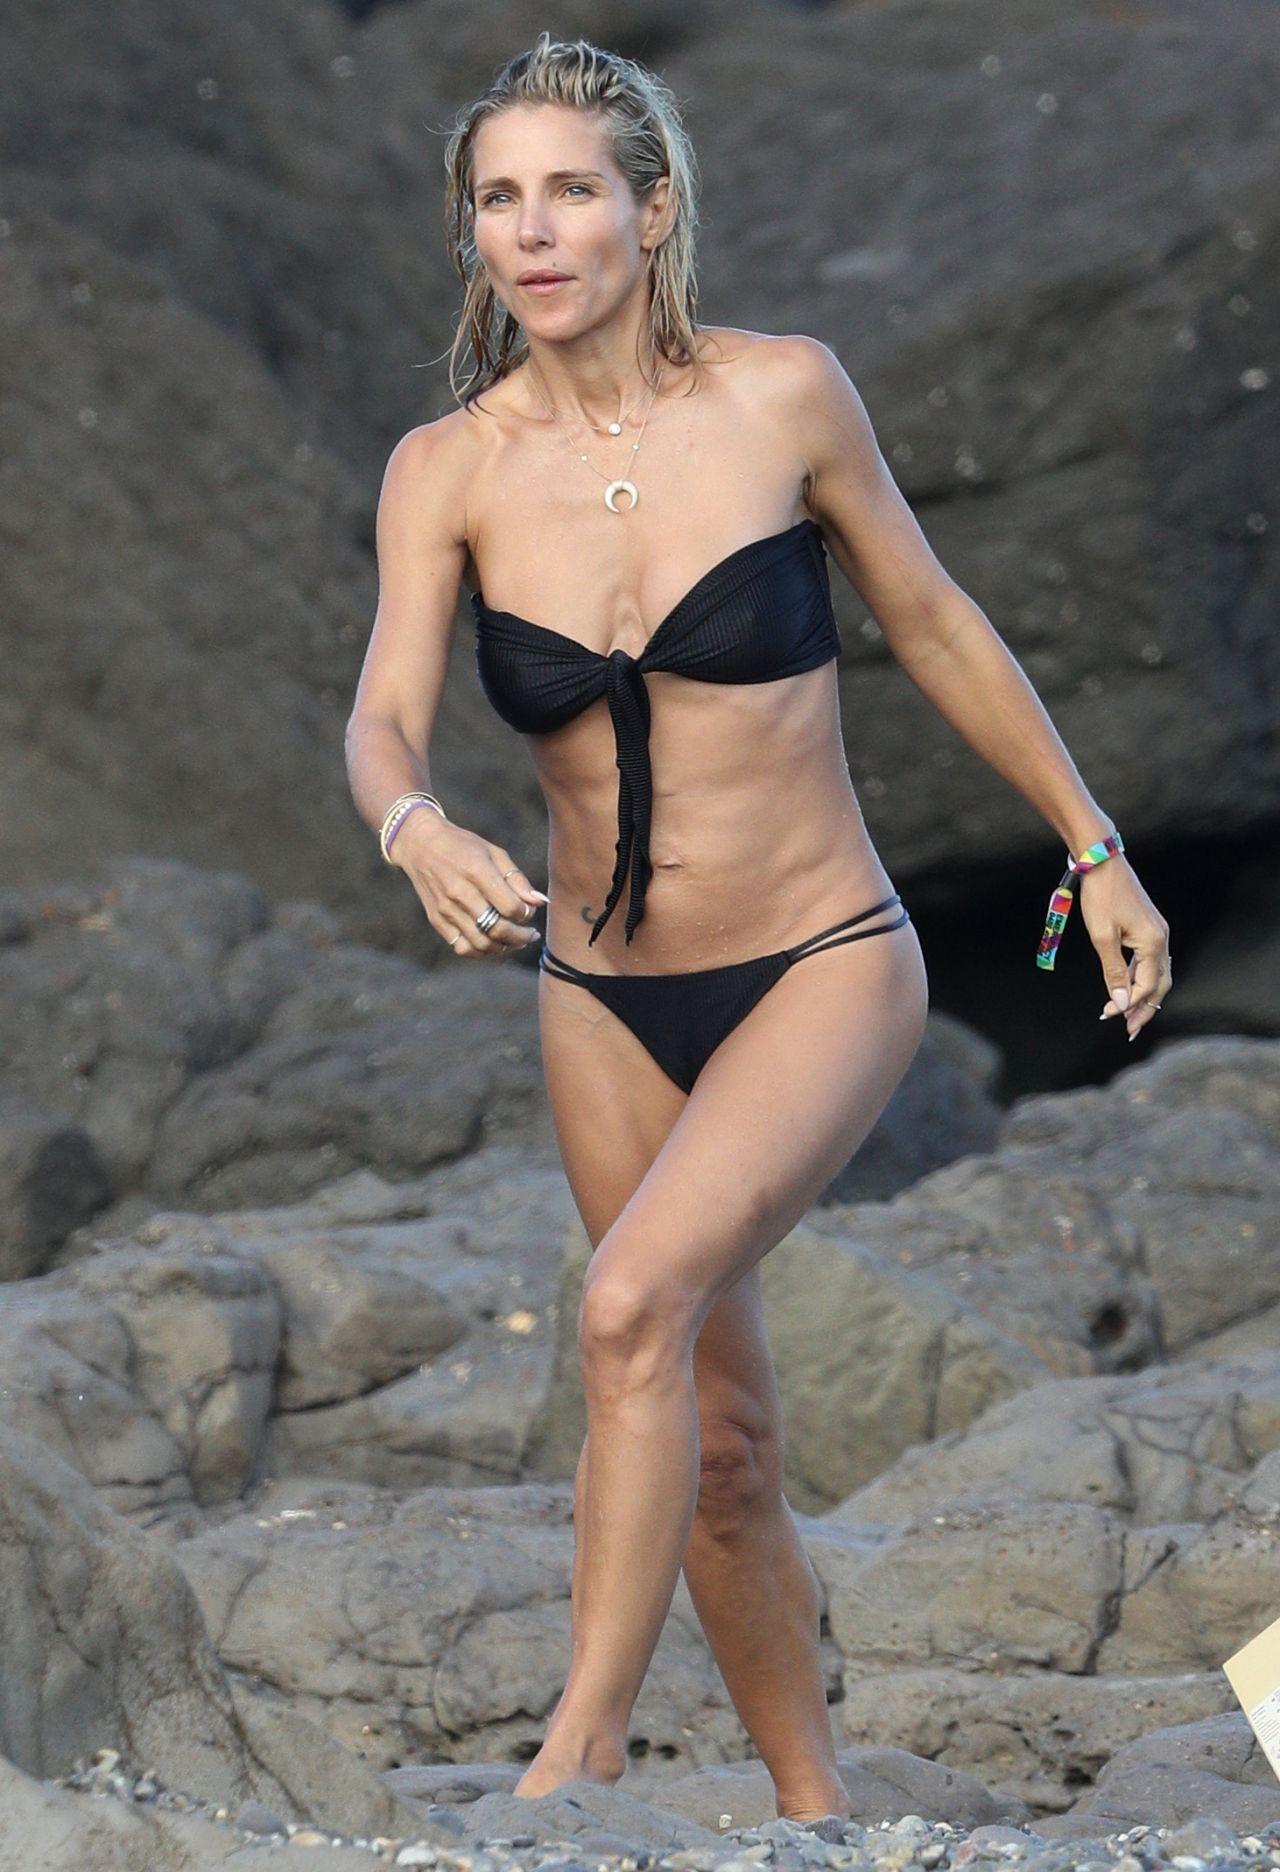 Gallery Bikini Constance Jablonski  nudes (27 photos), YouTube, see through